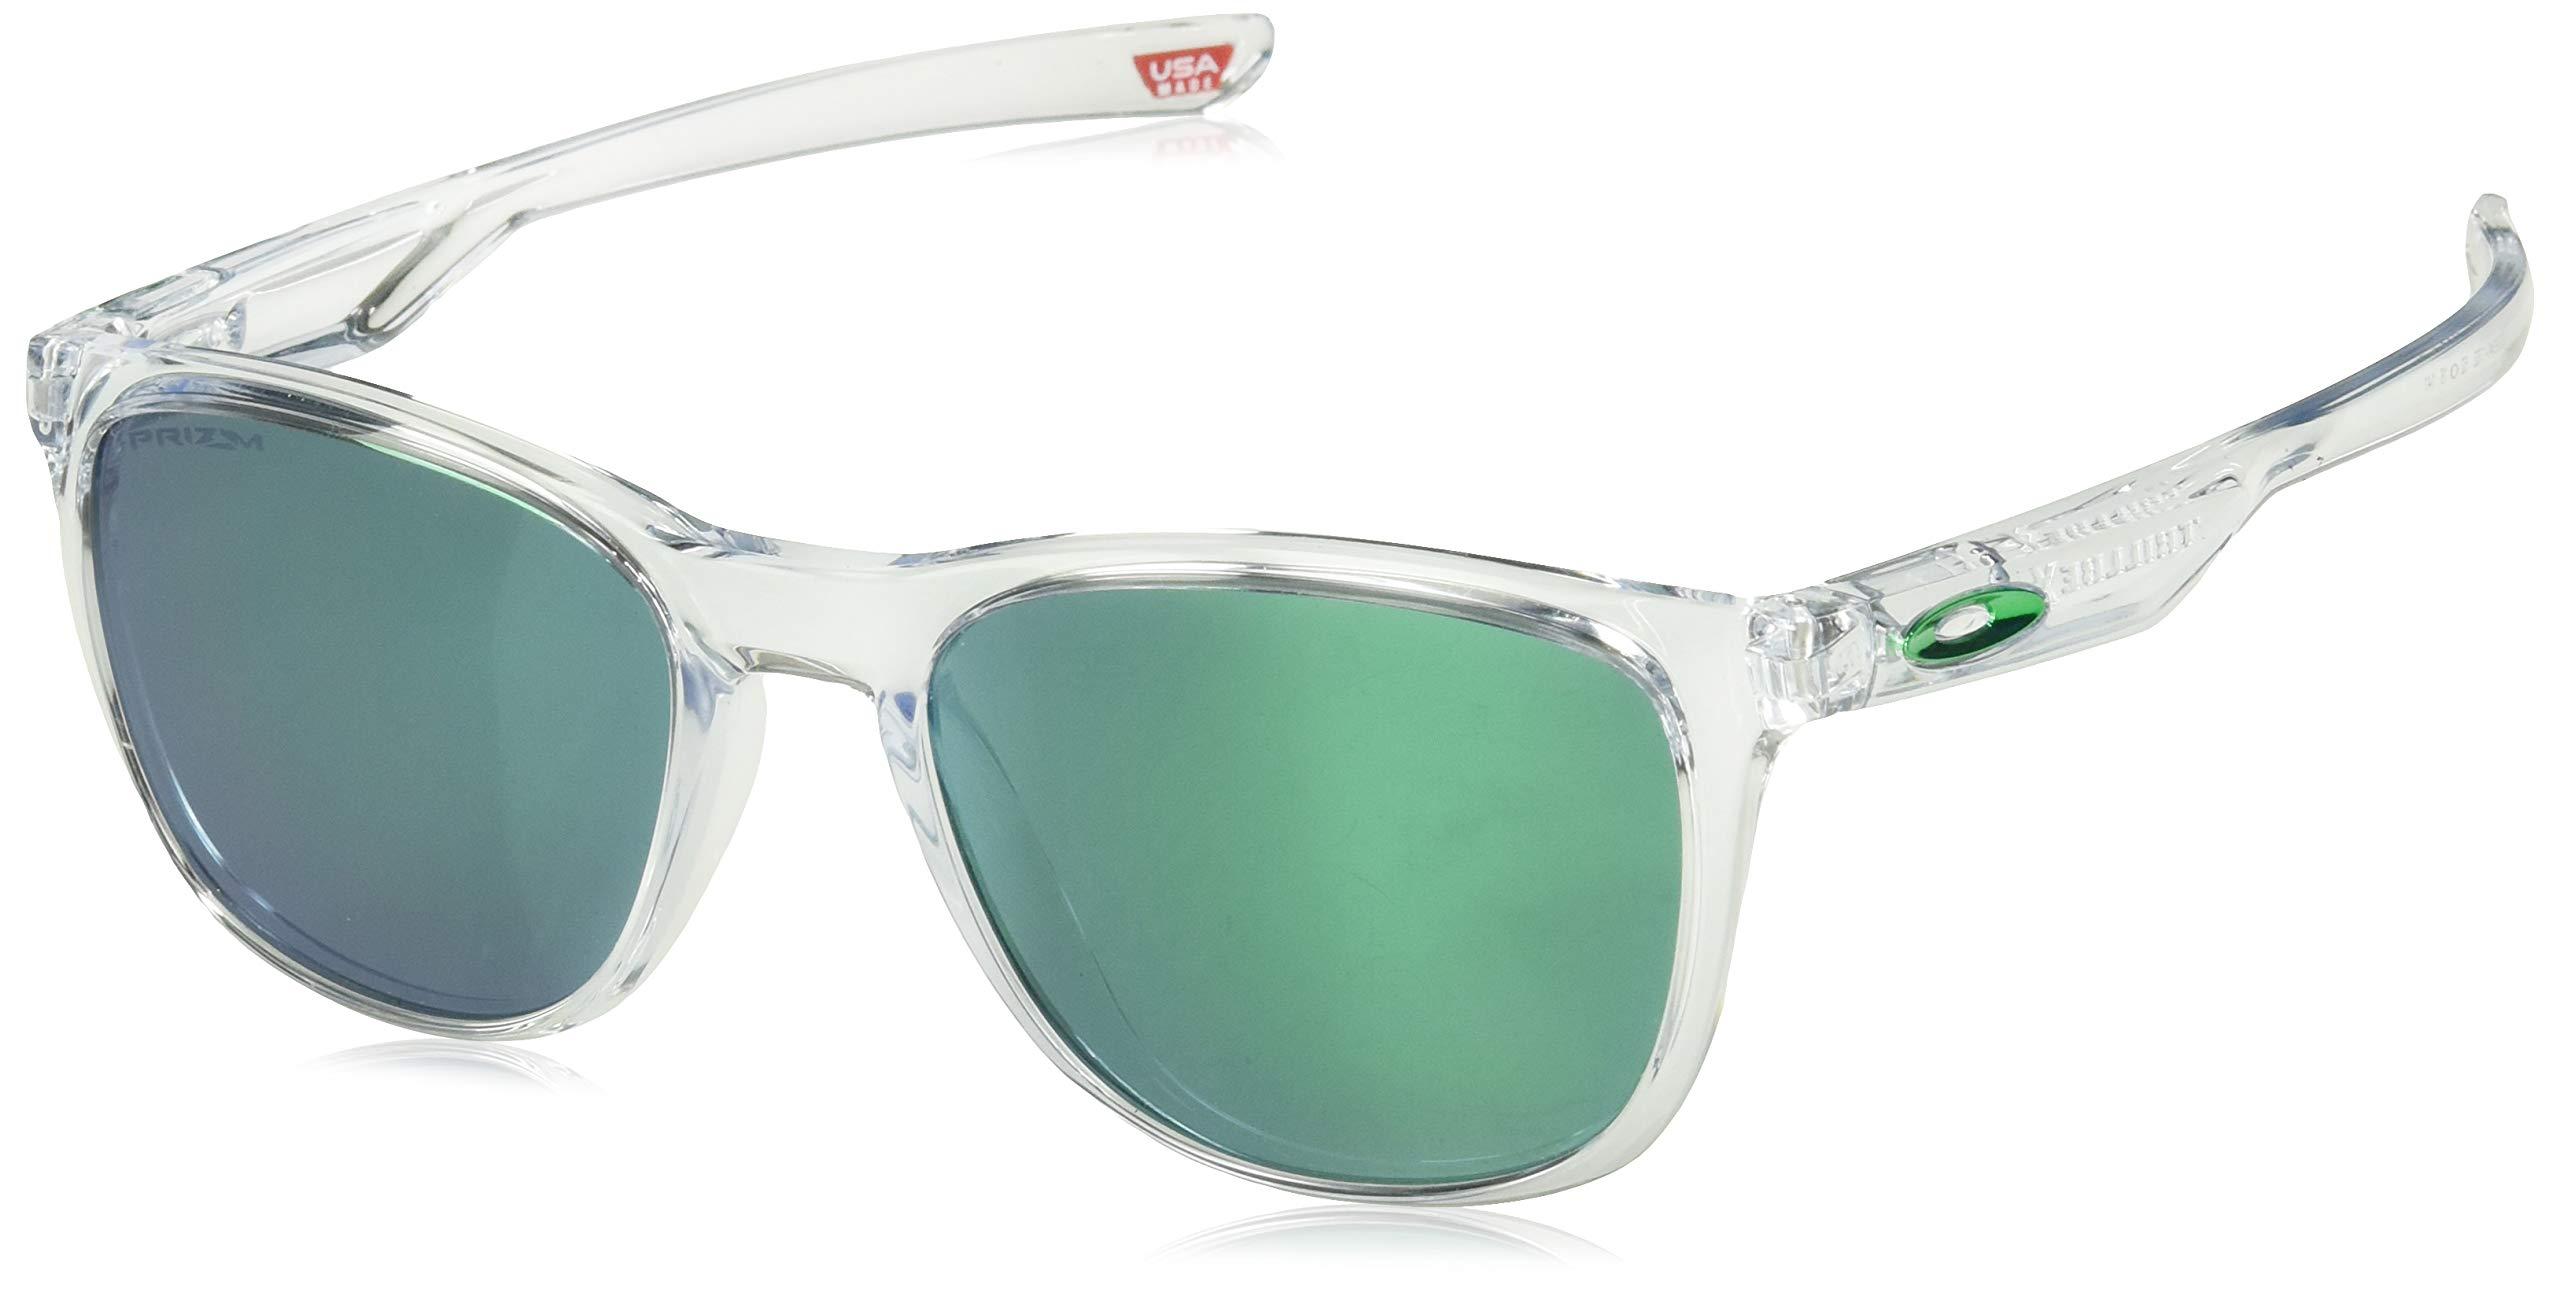 Oakley Men's Trillbe X Non-Polarized Iridium Rectangular Sunglasses, Polished Clear, 52.0 mm